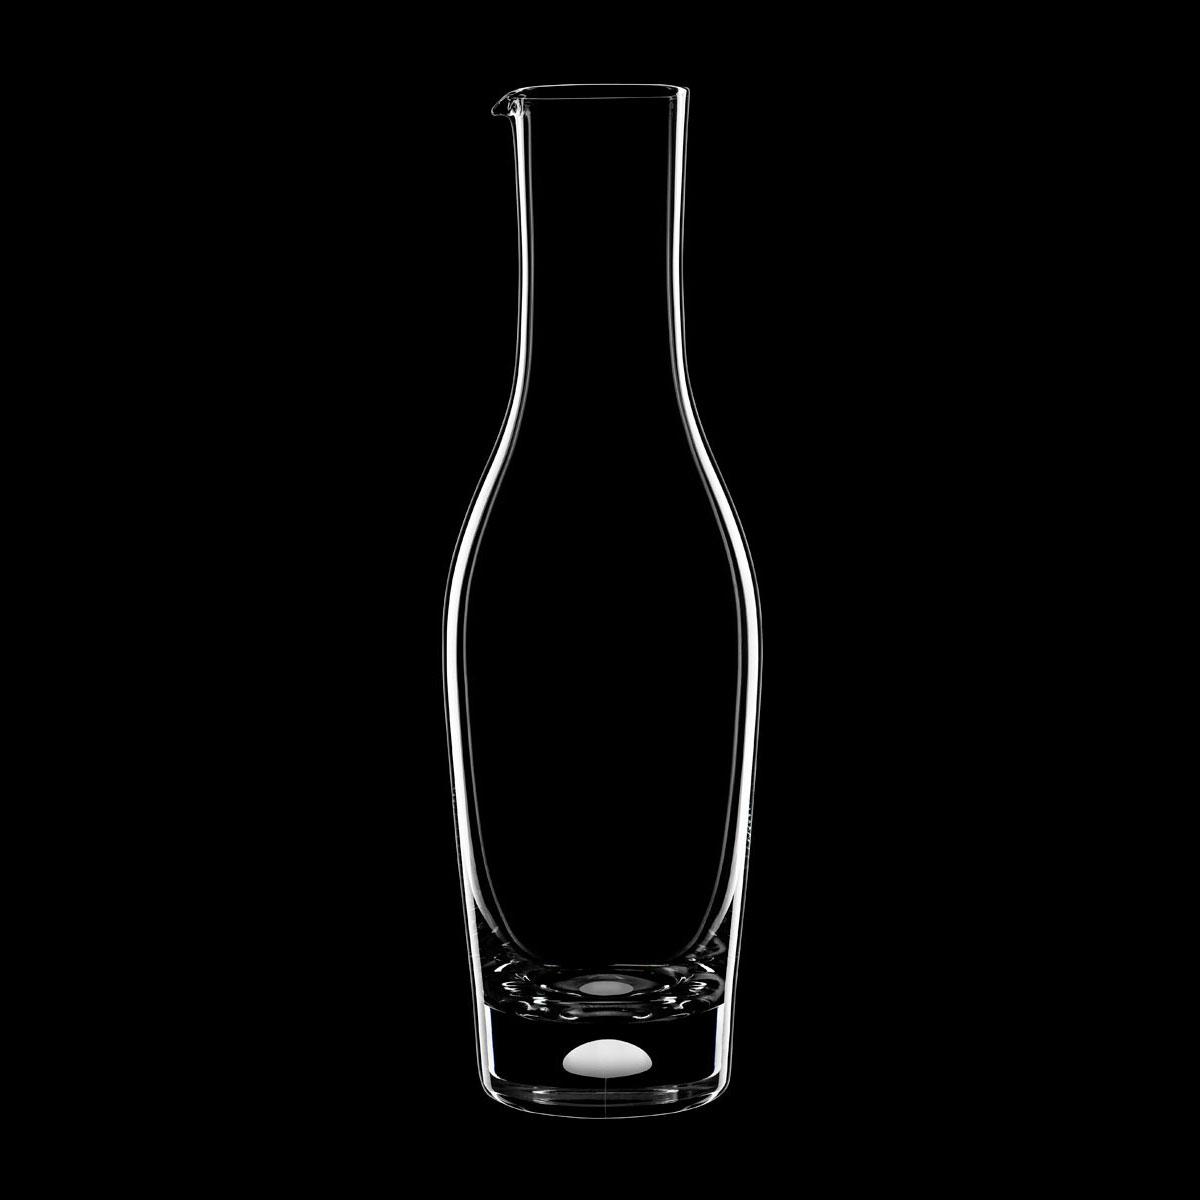 Orrefors Crystal, Intermezzo Satin Wine Decanter